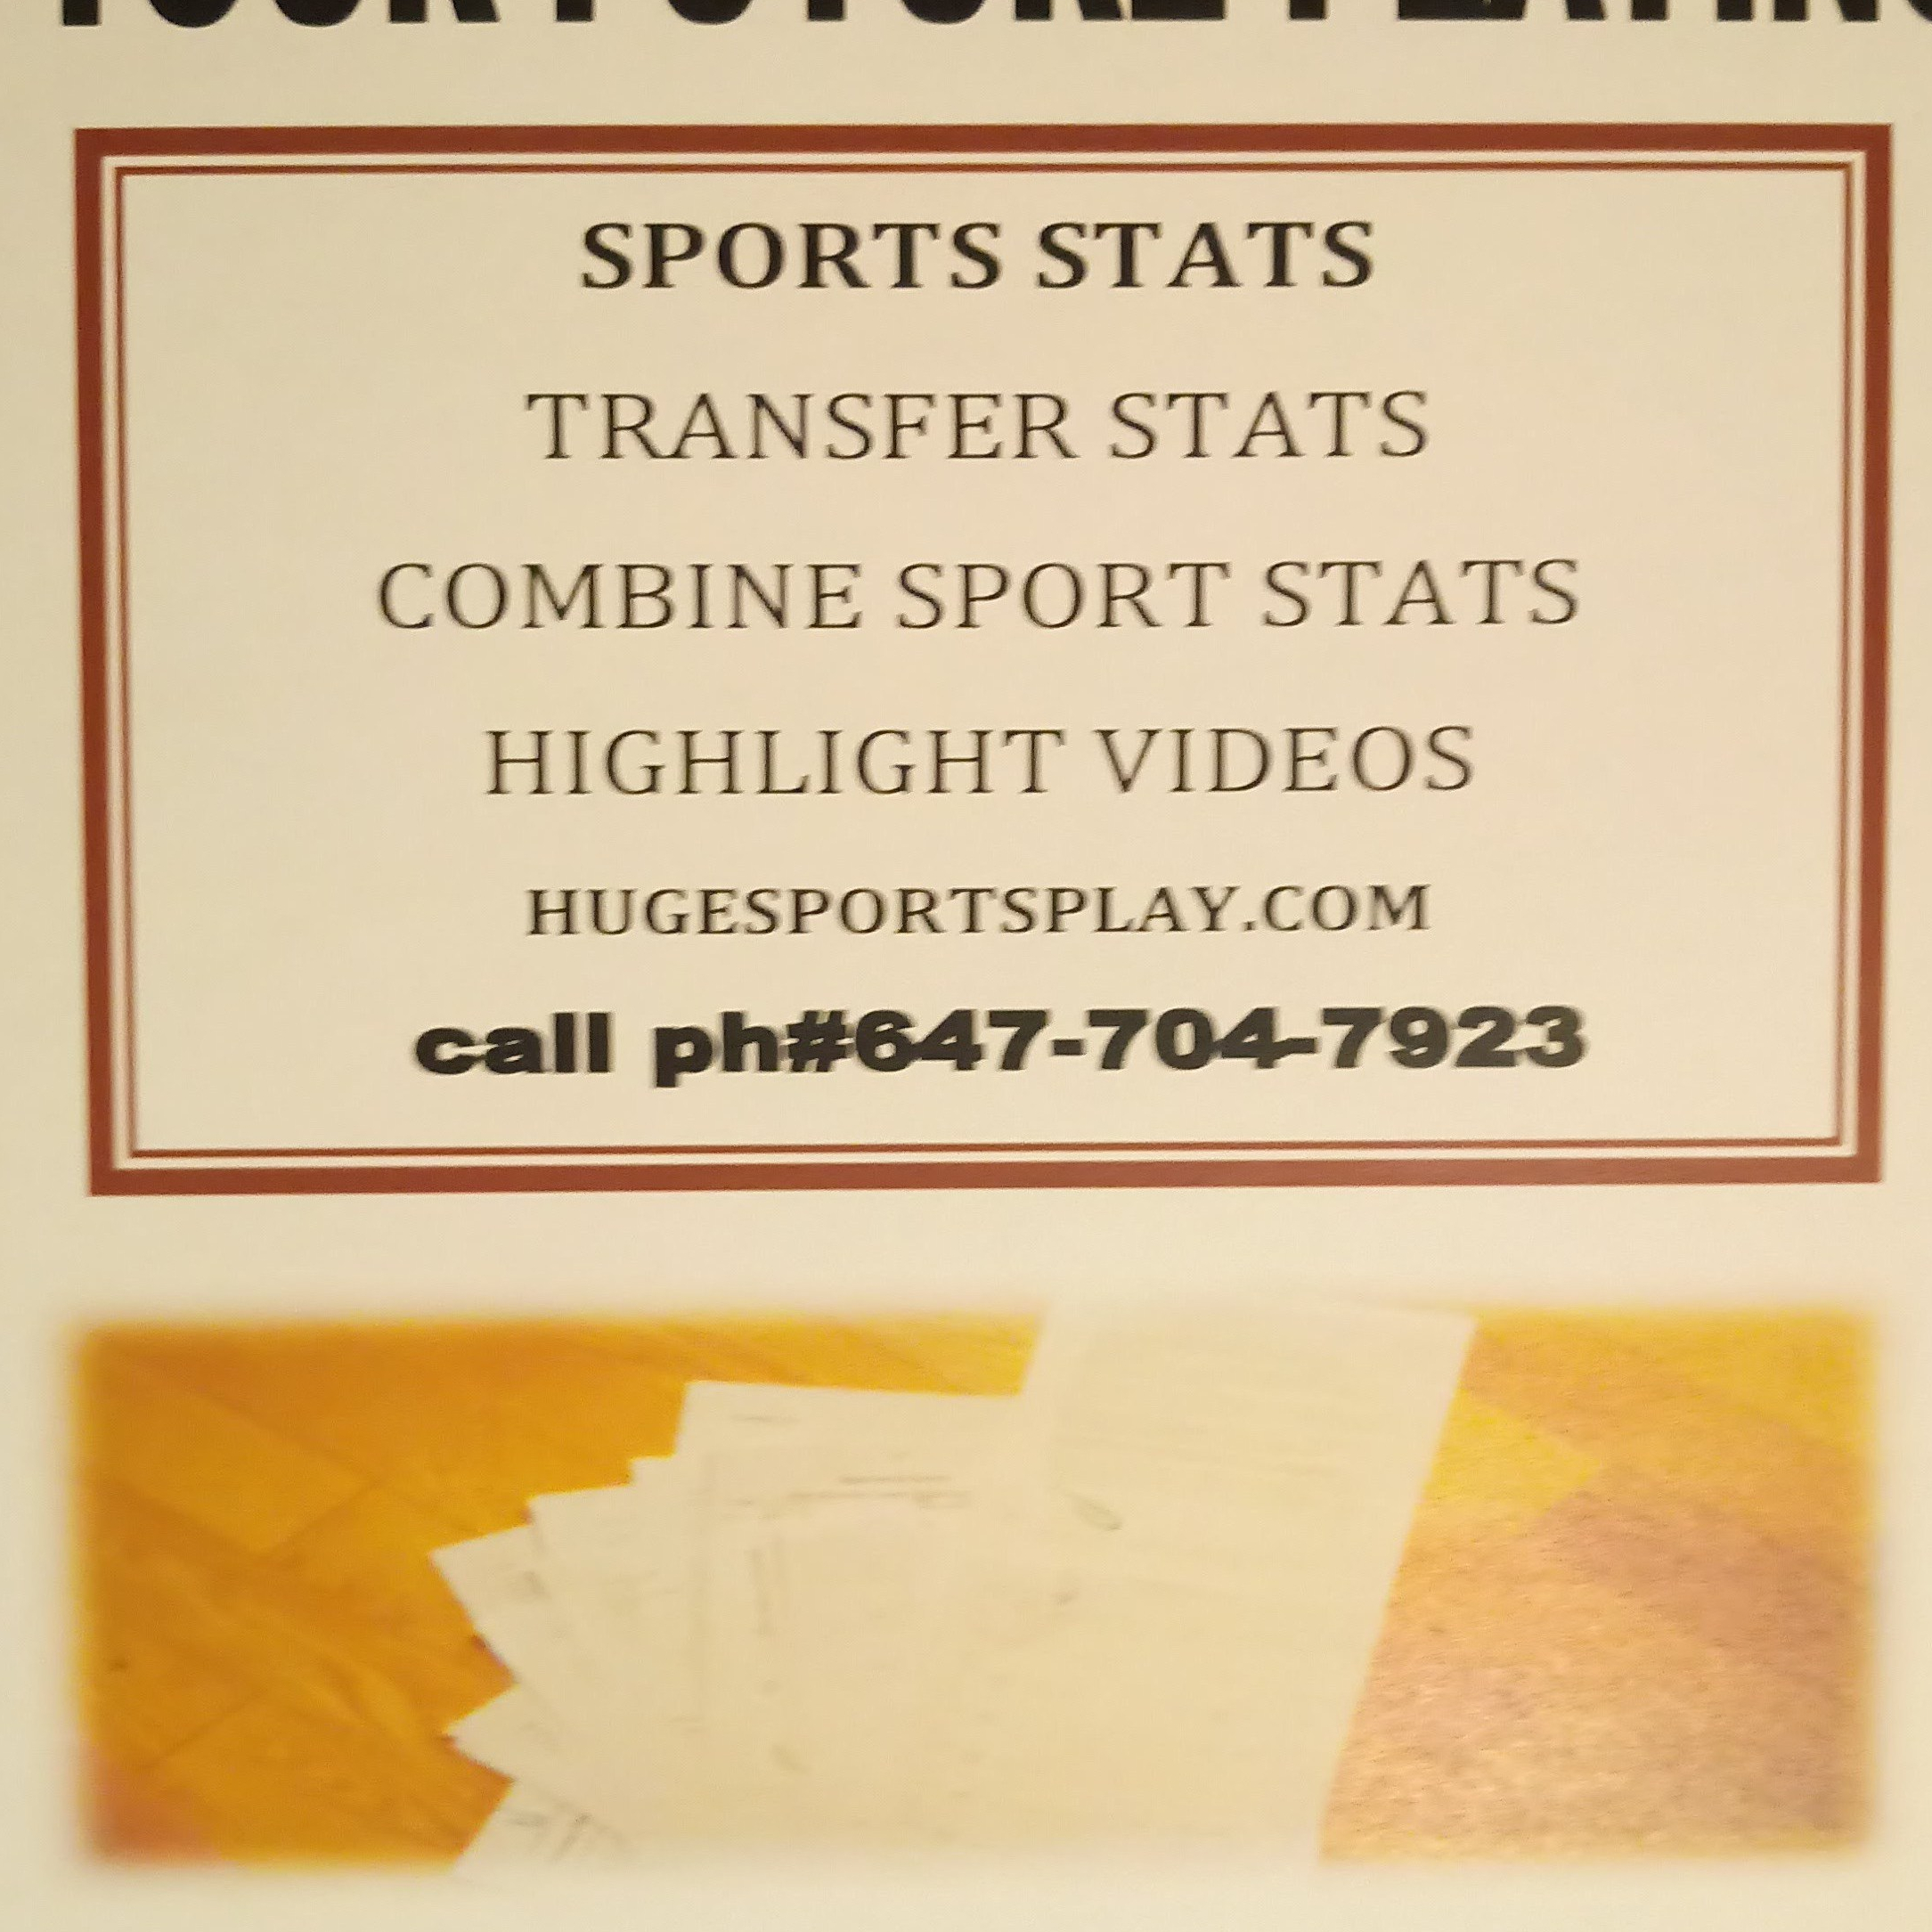 Huge Sports Play